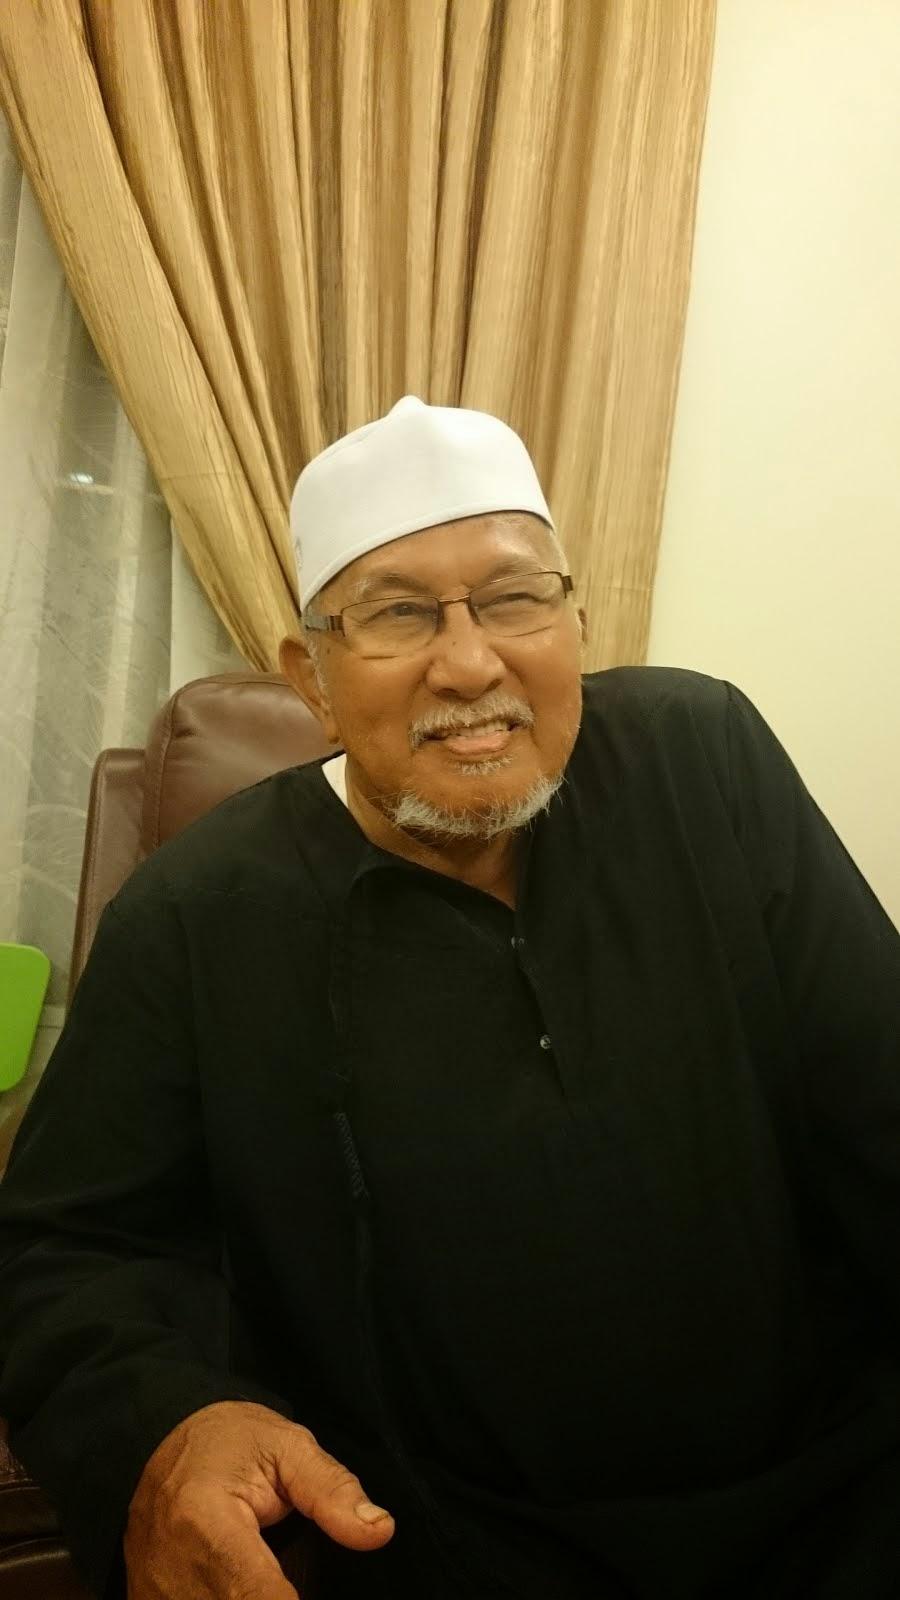 Haji Muhammed Hj Long@Cikgu Mat Tampal